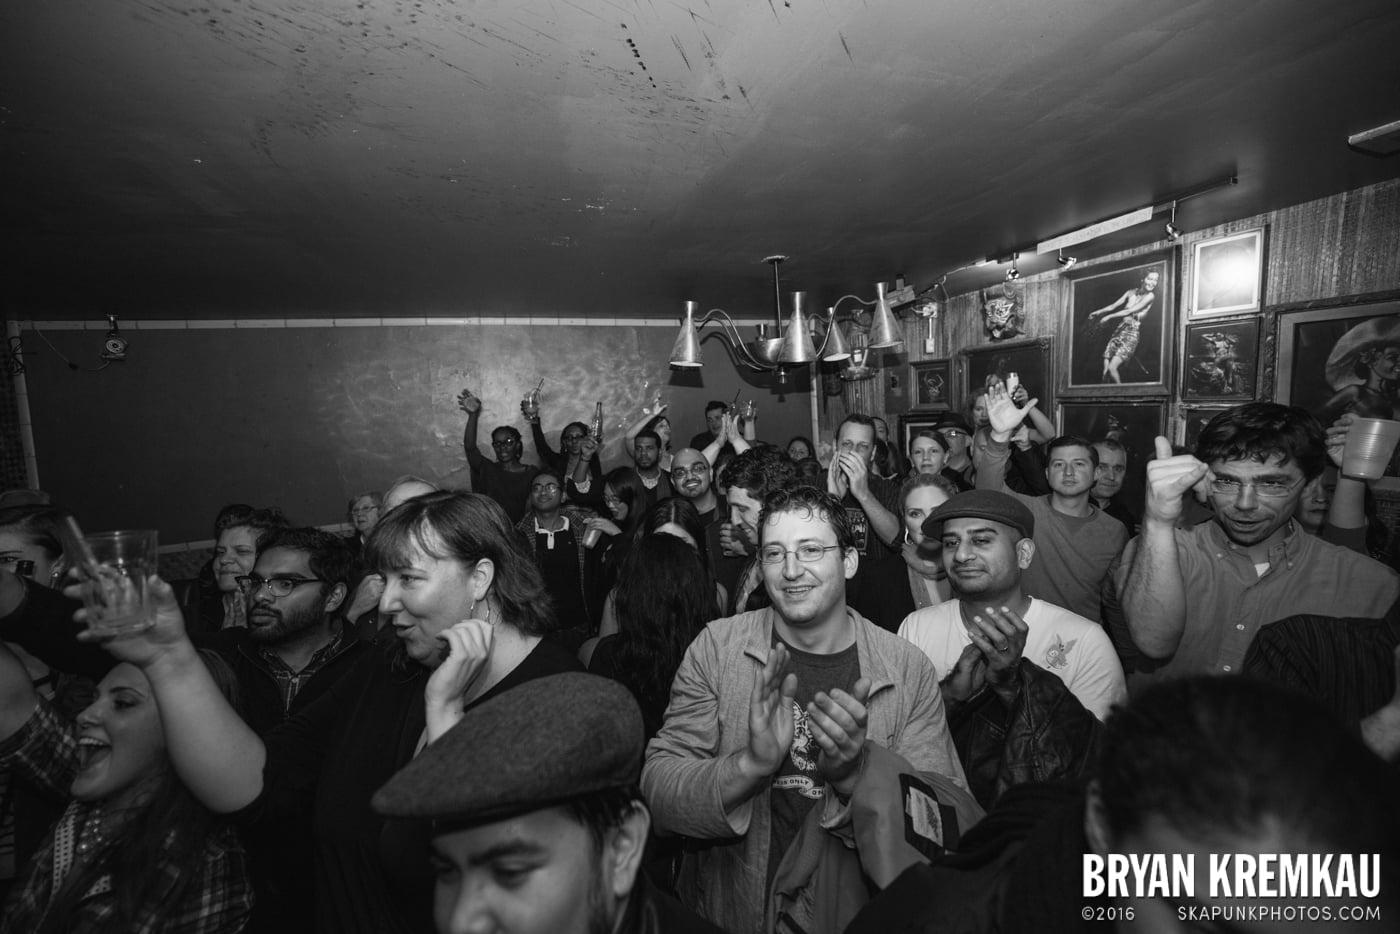 Rude Boy George @ Otto's Shrunken Head, NYC - 12.5.14 (12)